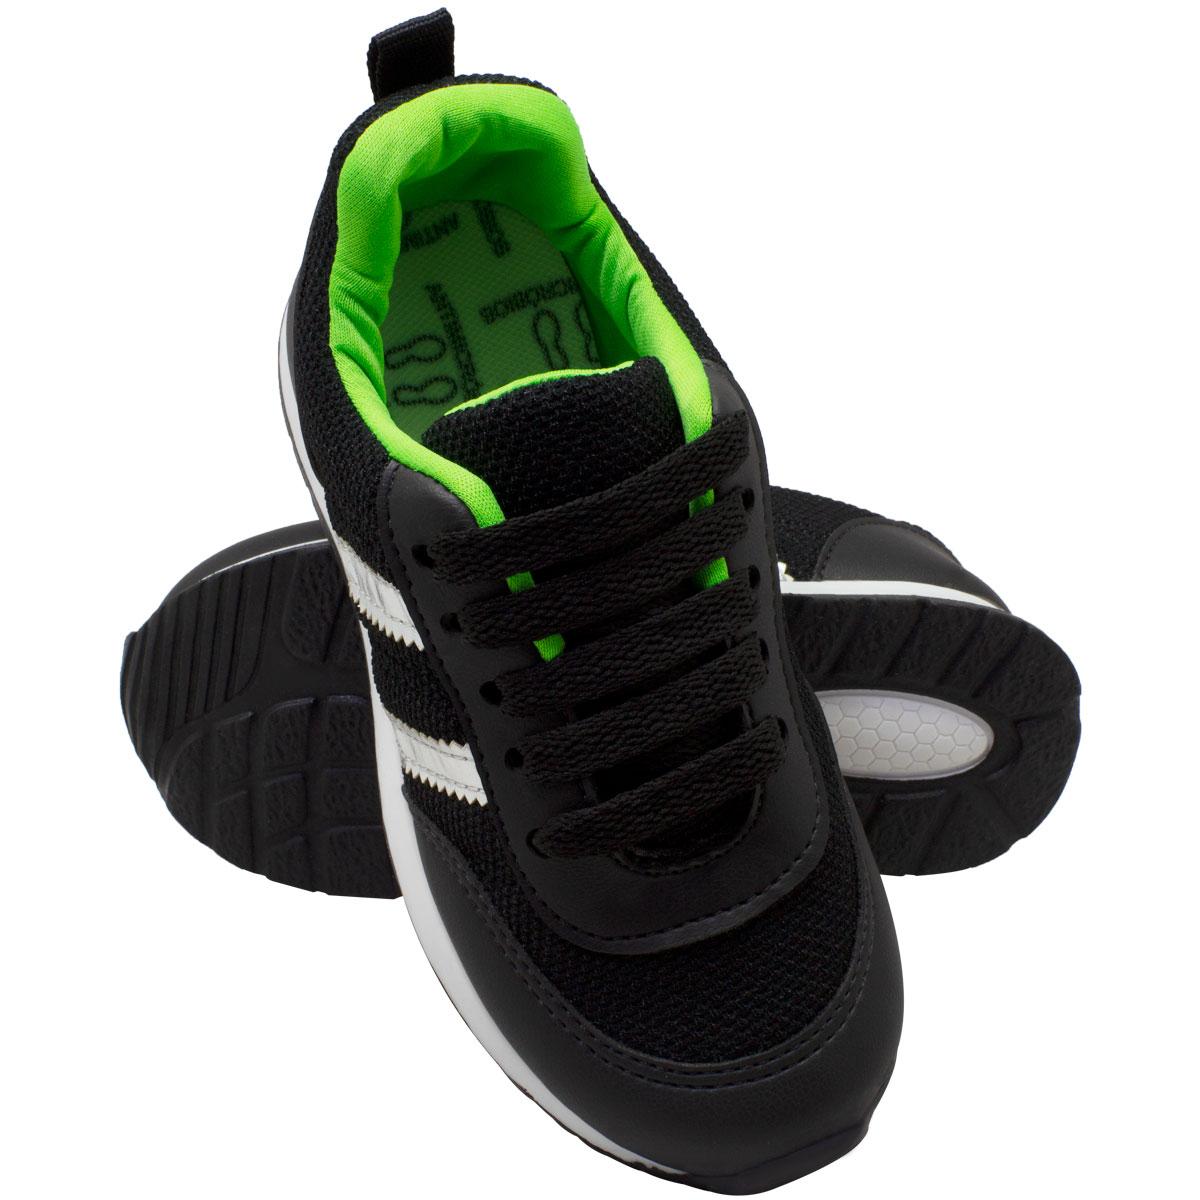 Tênis infantil masculino jogging c/biqueira 152-04-32X